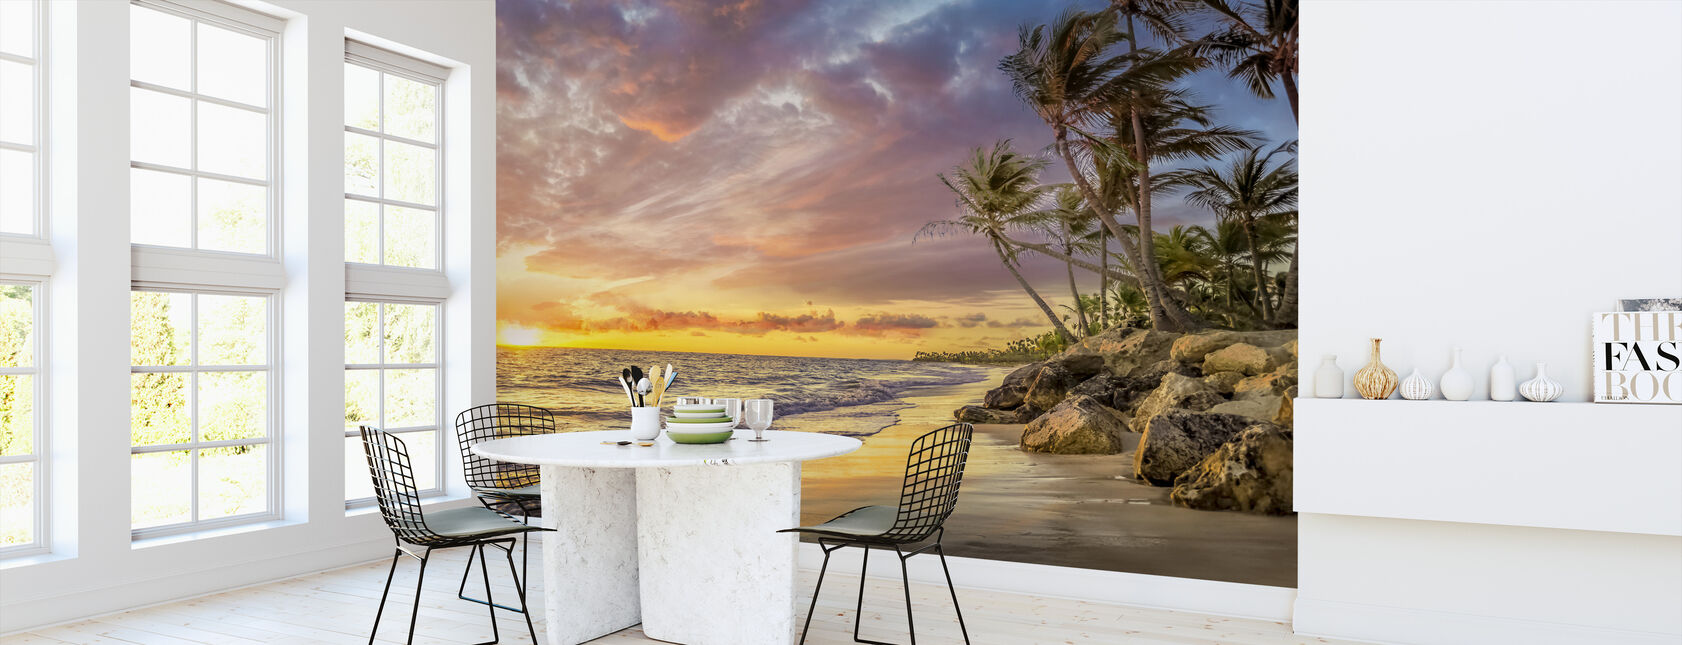 Palm Tree in Sunset - Wallpaper - Kitchen